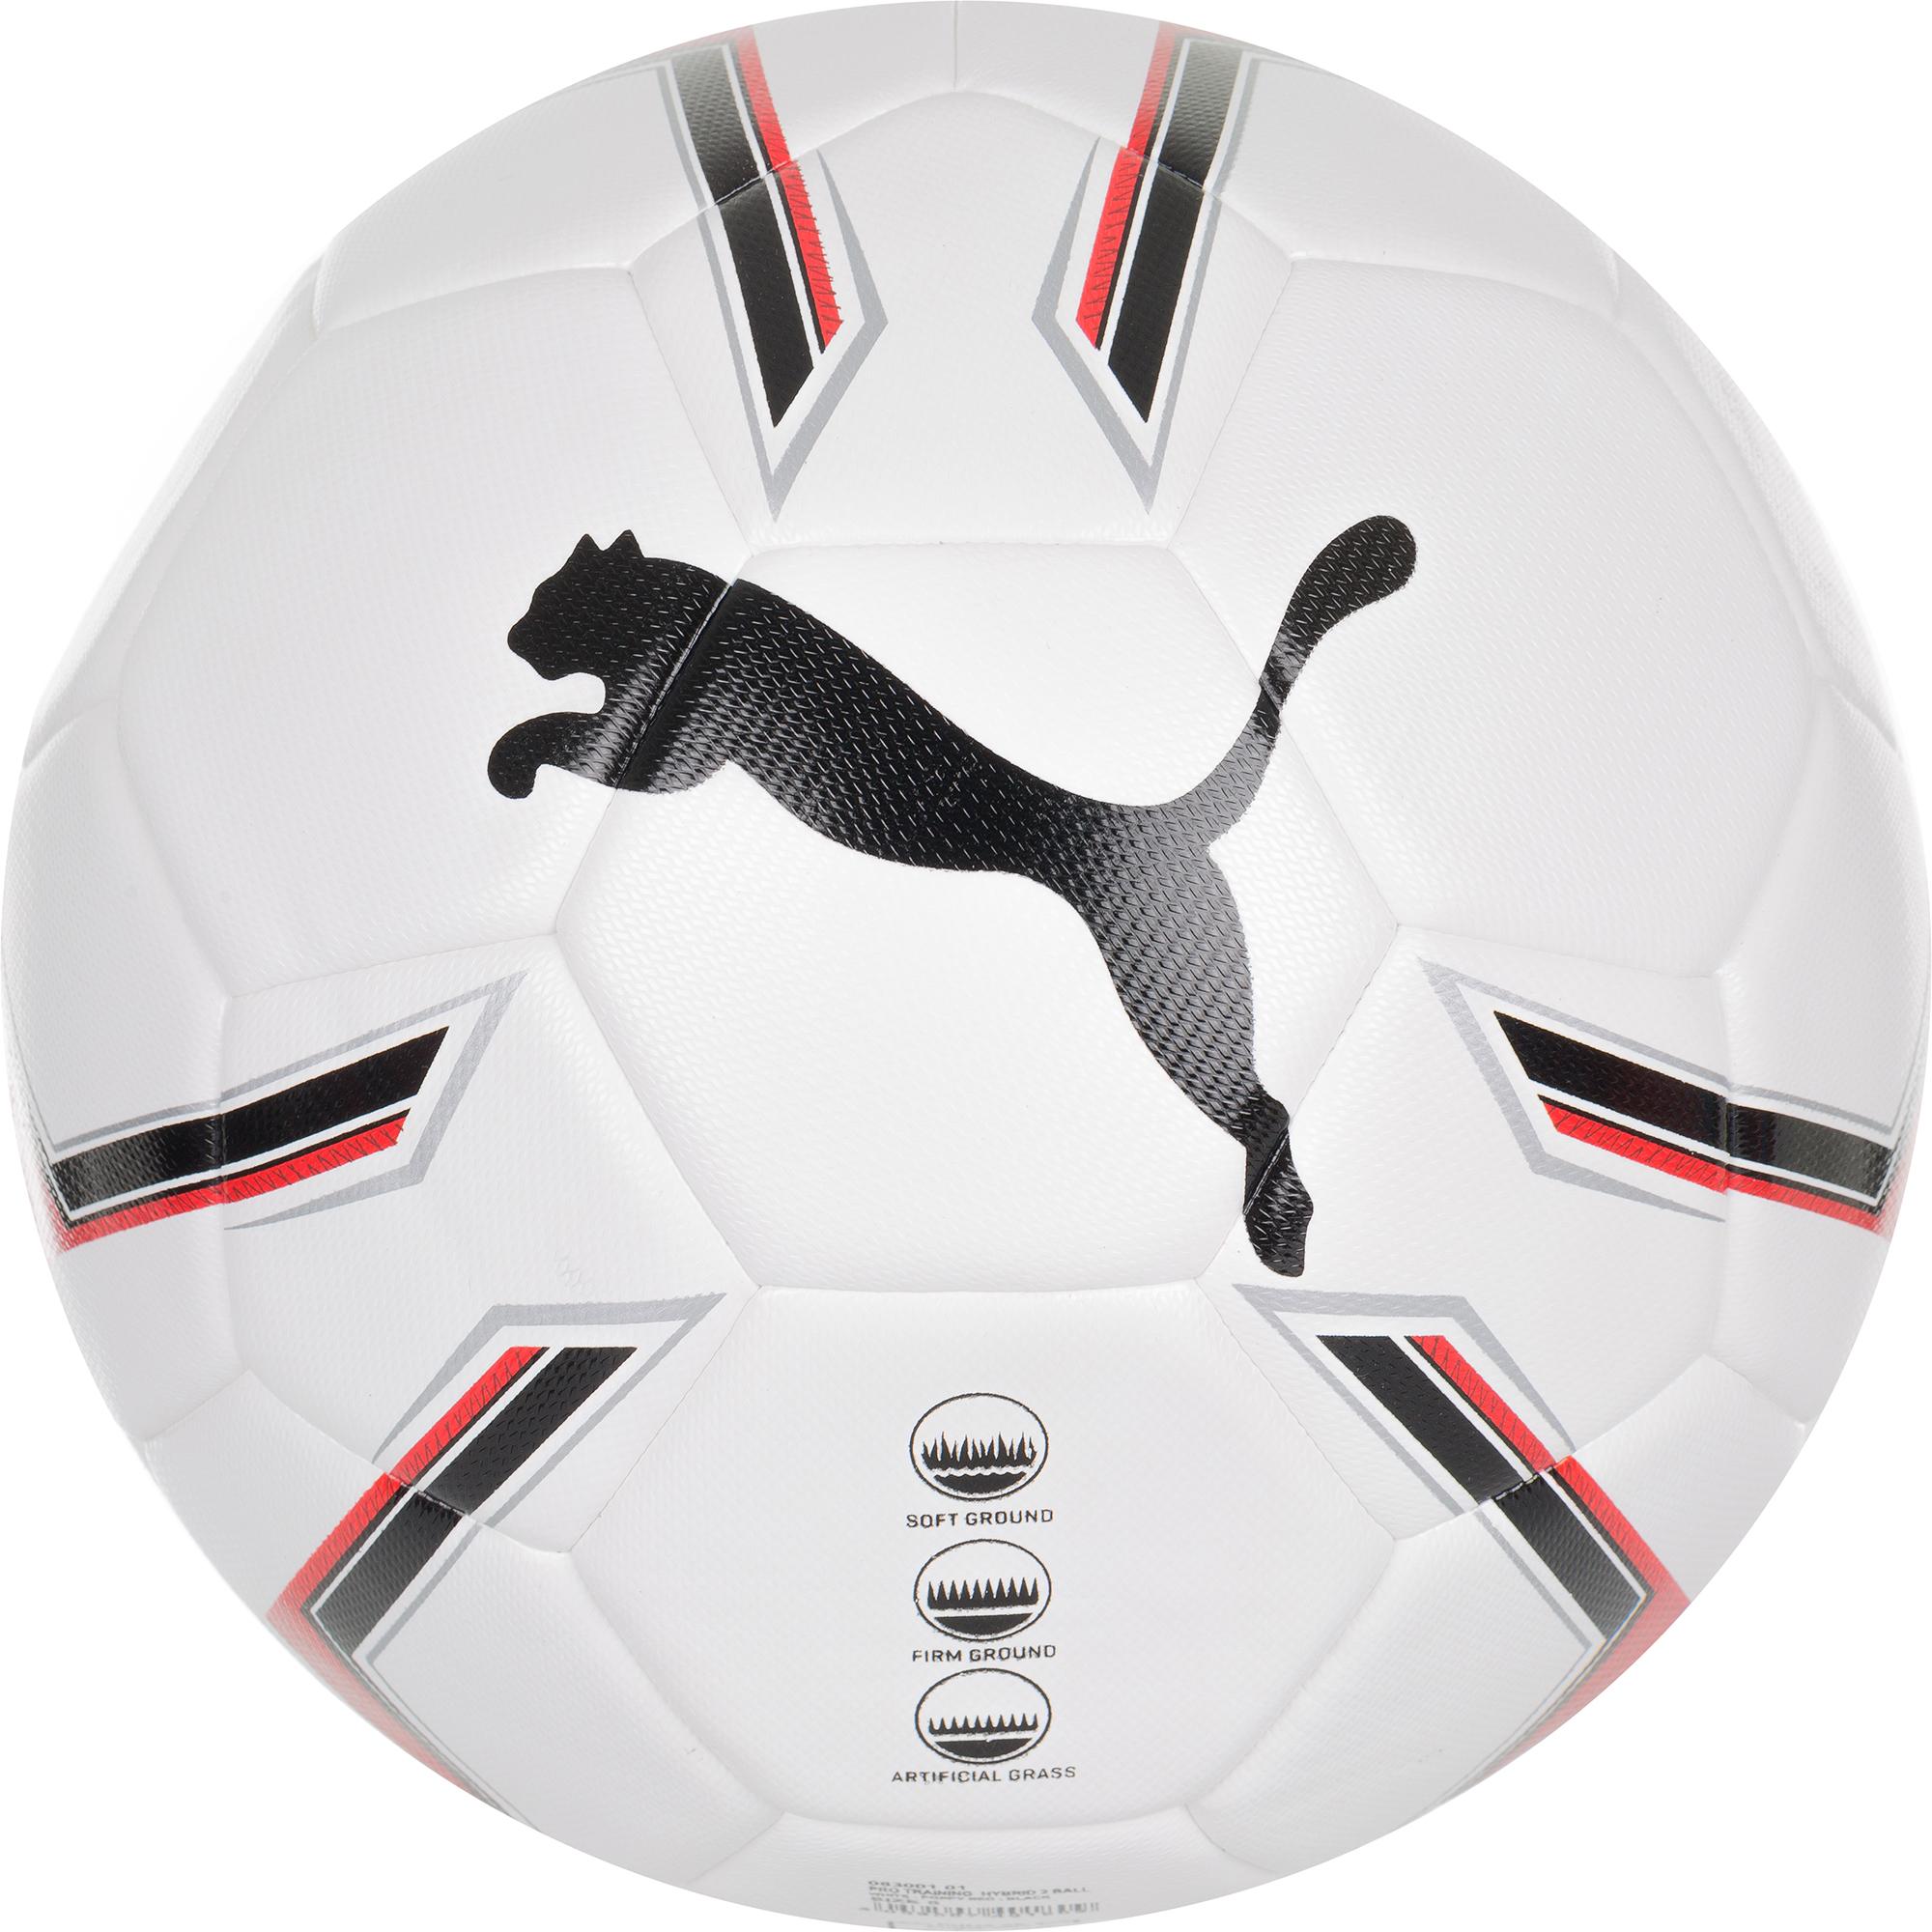 Puma Мяч футбольный Puma Pro Trainig, размер 5 puma puma evospeed 5 4 it